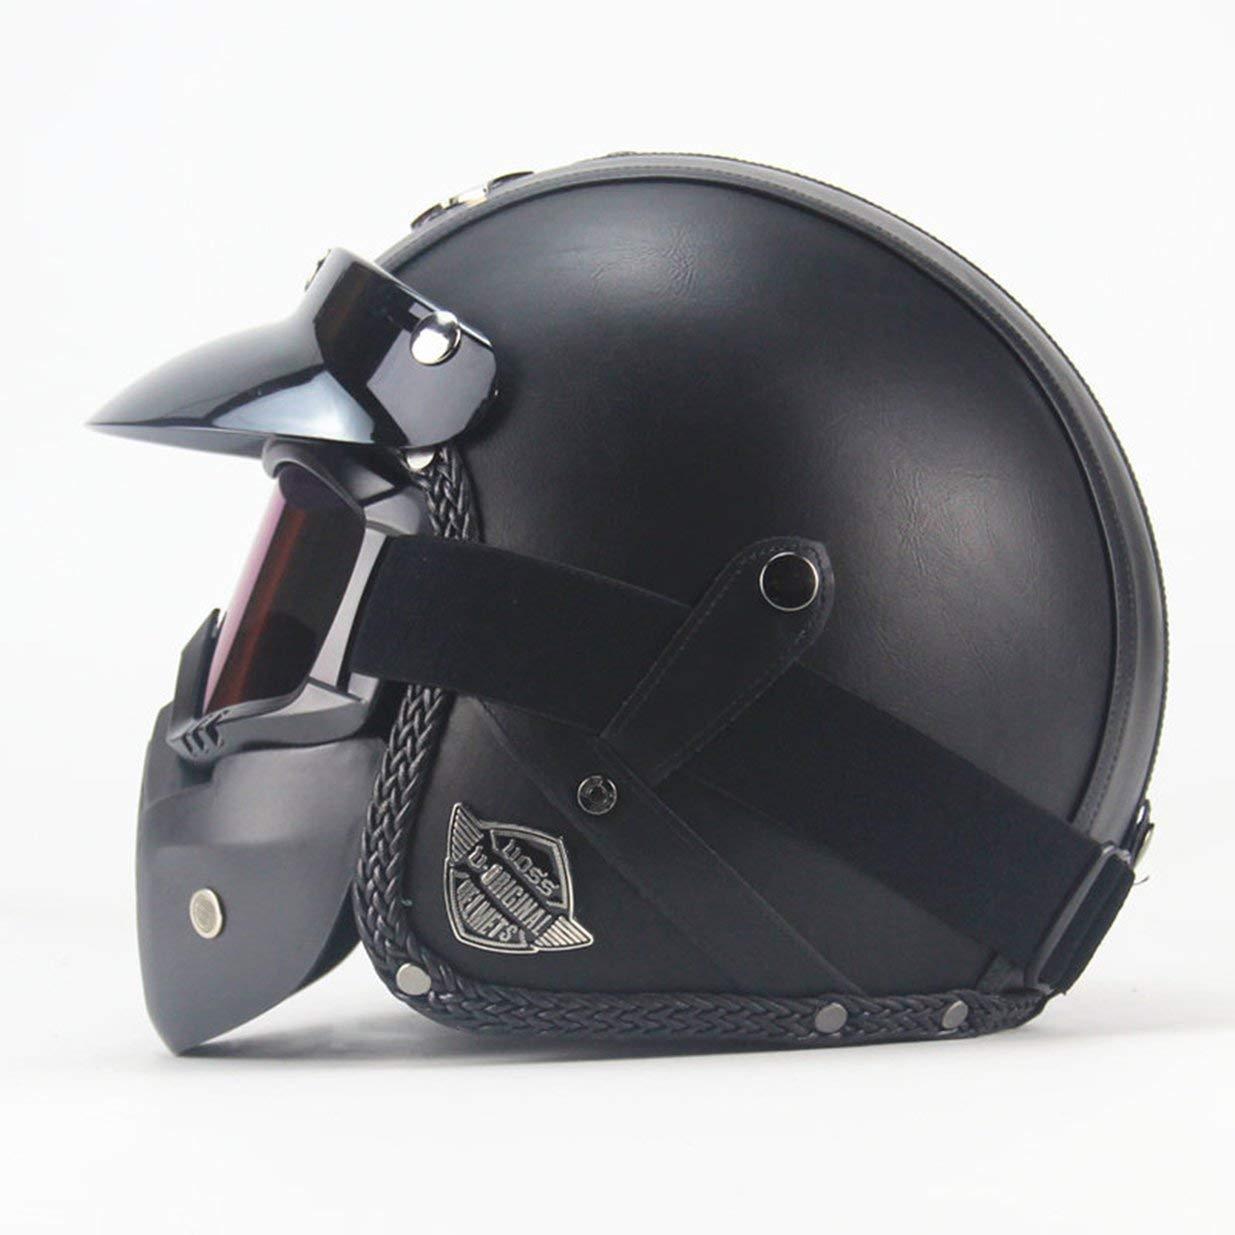 Dark Gray 2058L para Motocicleta 3//4 dise/ño Retro Exquisito Hecho a Mano Coche Casco cl/ásico de Cuatro Estaciones AOKOULV